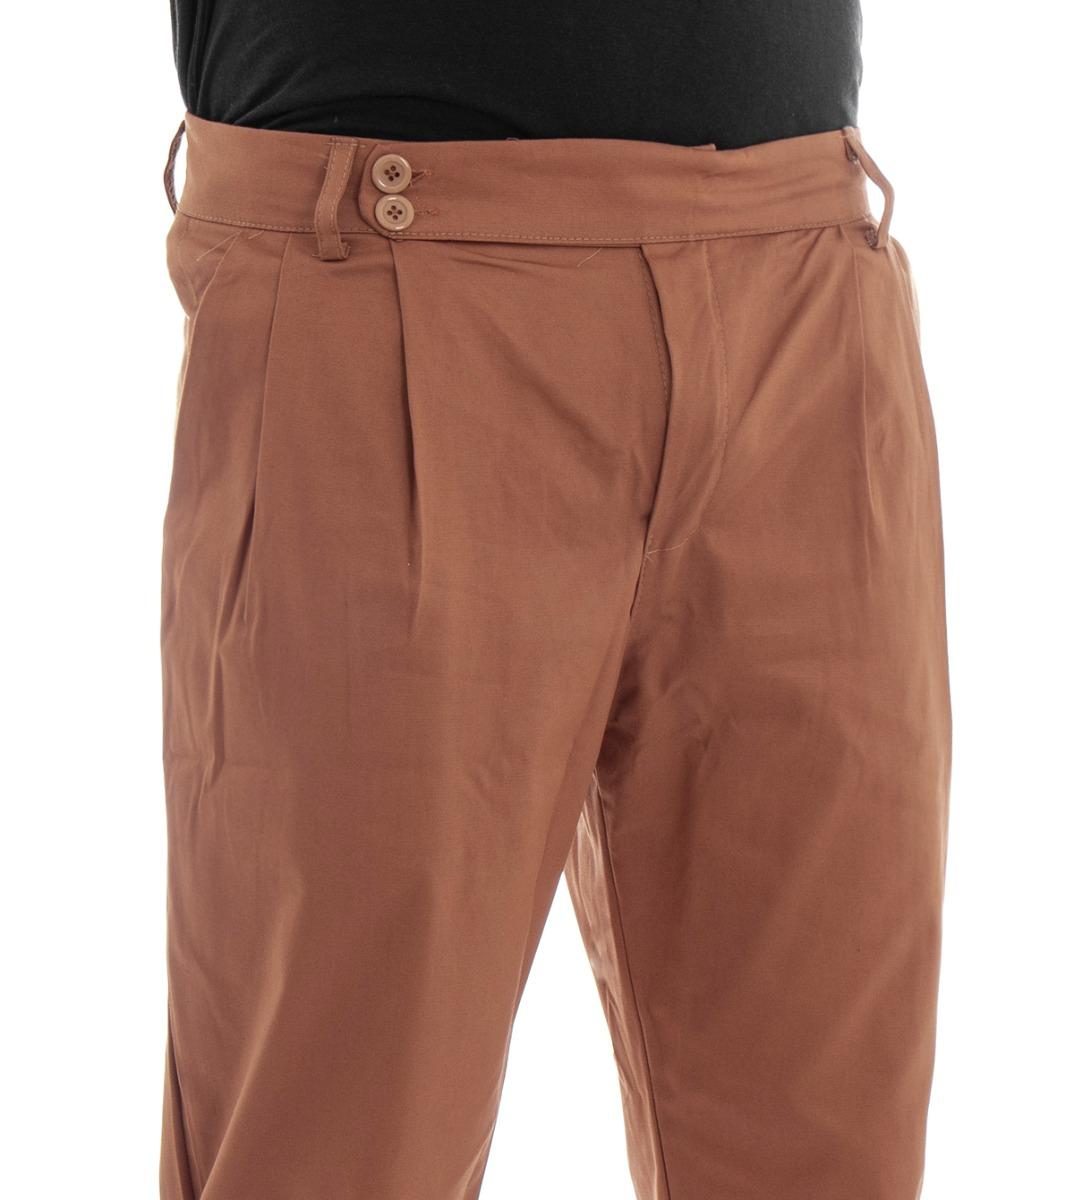 Pantalone-Uomo-Tasca-America-Mattone-Cavallo-Basso-Casual-Pence-GIOSAL miniatura 5